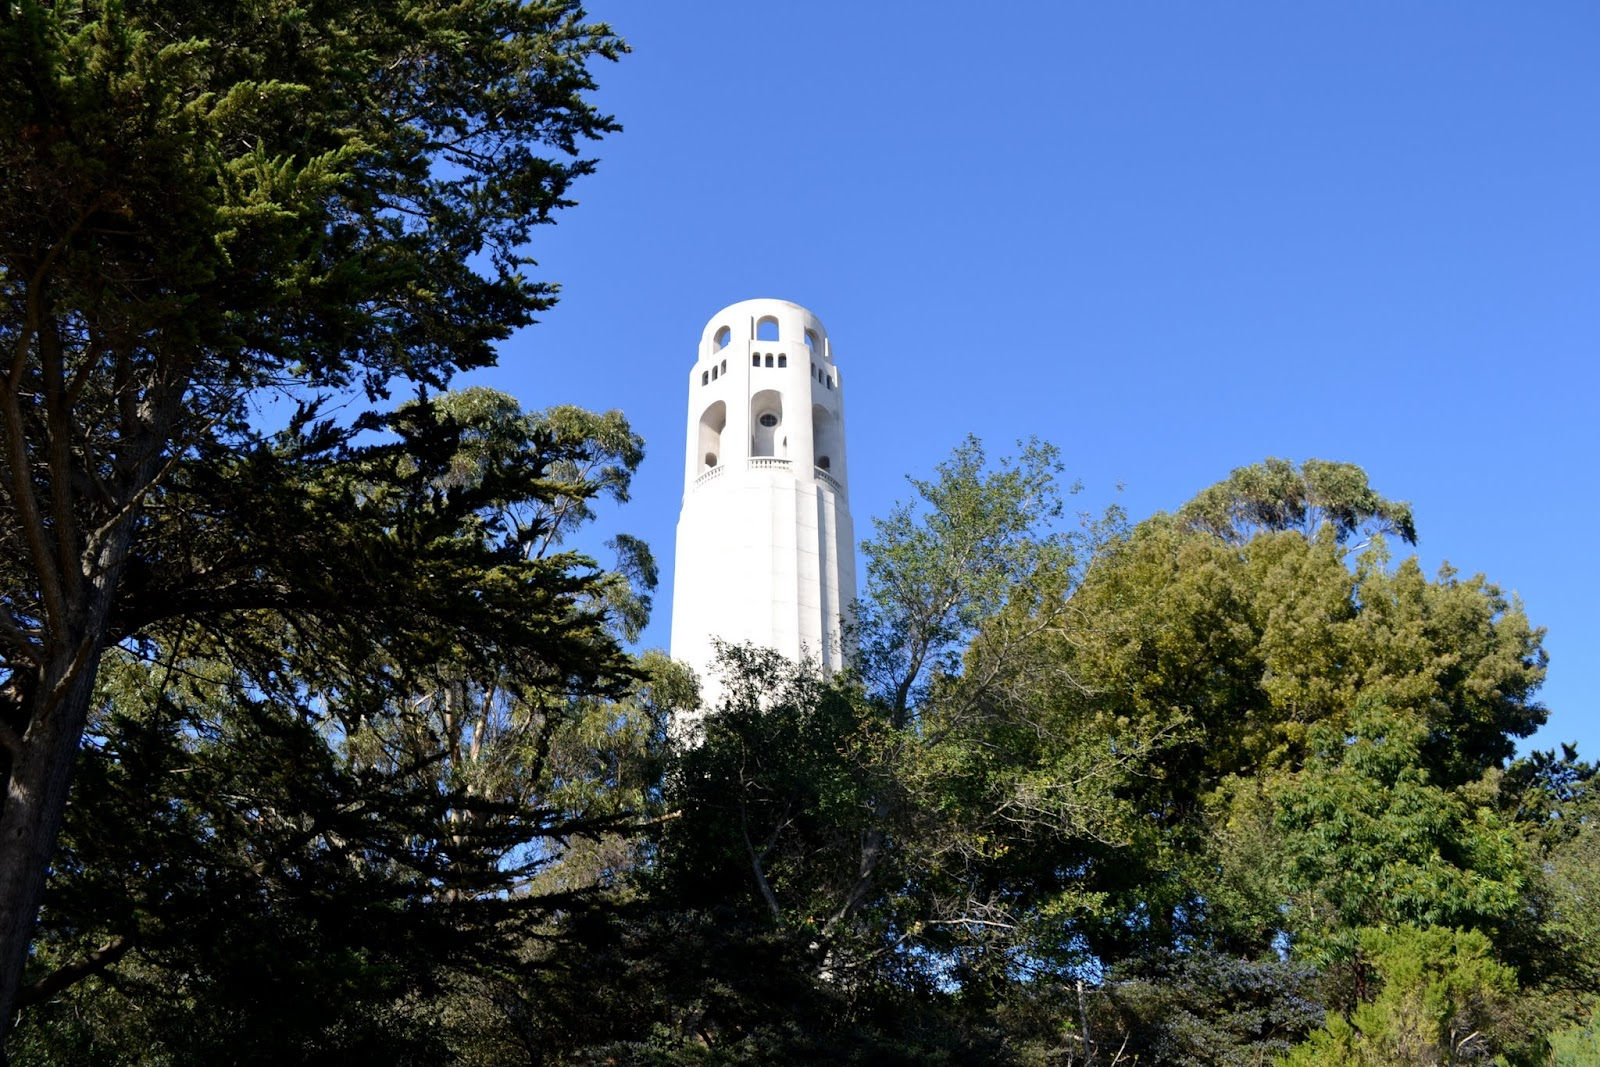 Башне Койт. Сан-Франциско, Калифорния. (Coit Tower, San Francisco, CA)